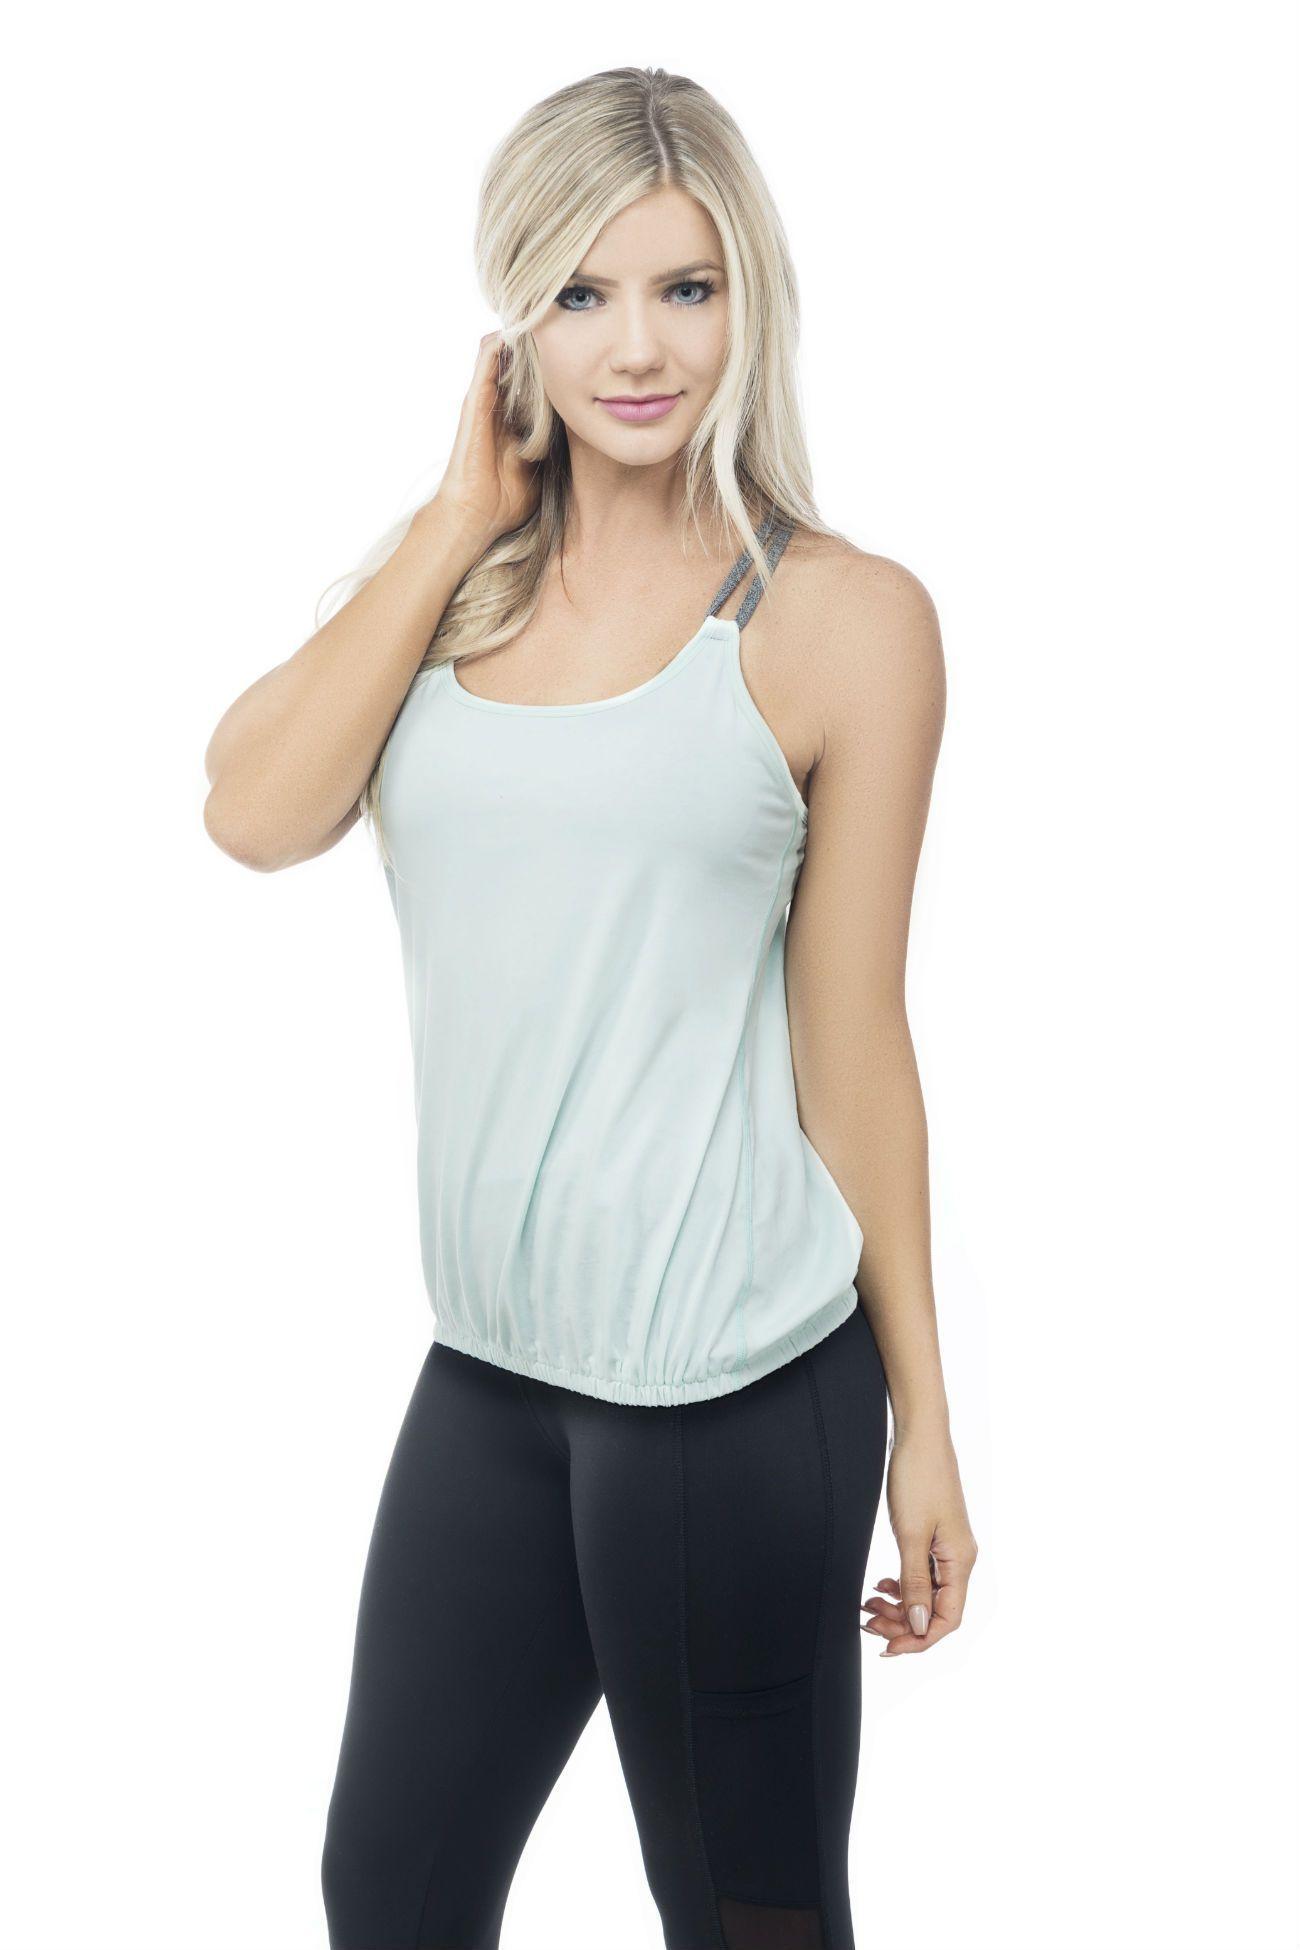 MFF Cross Back Tank Mint Supportive sports bras, Fashion